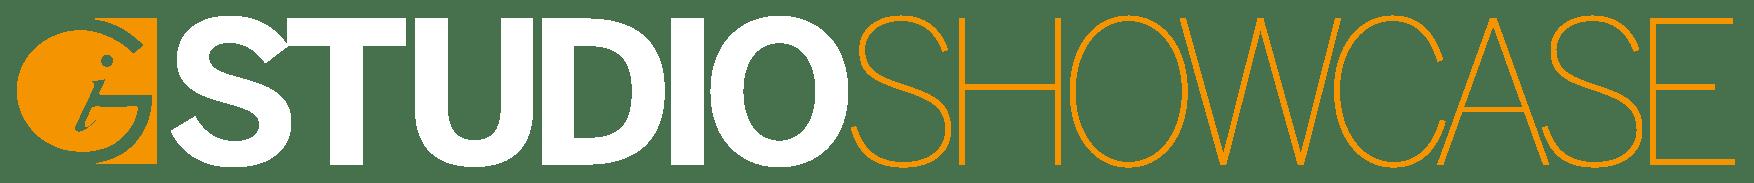 Gaming Intelligence Studio Showcase Logo